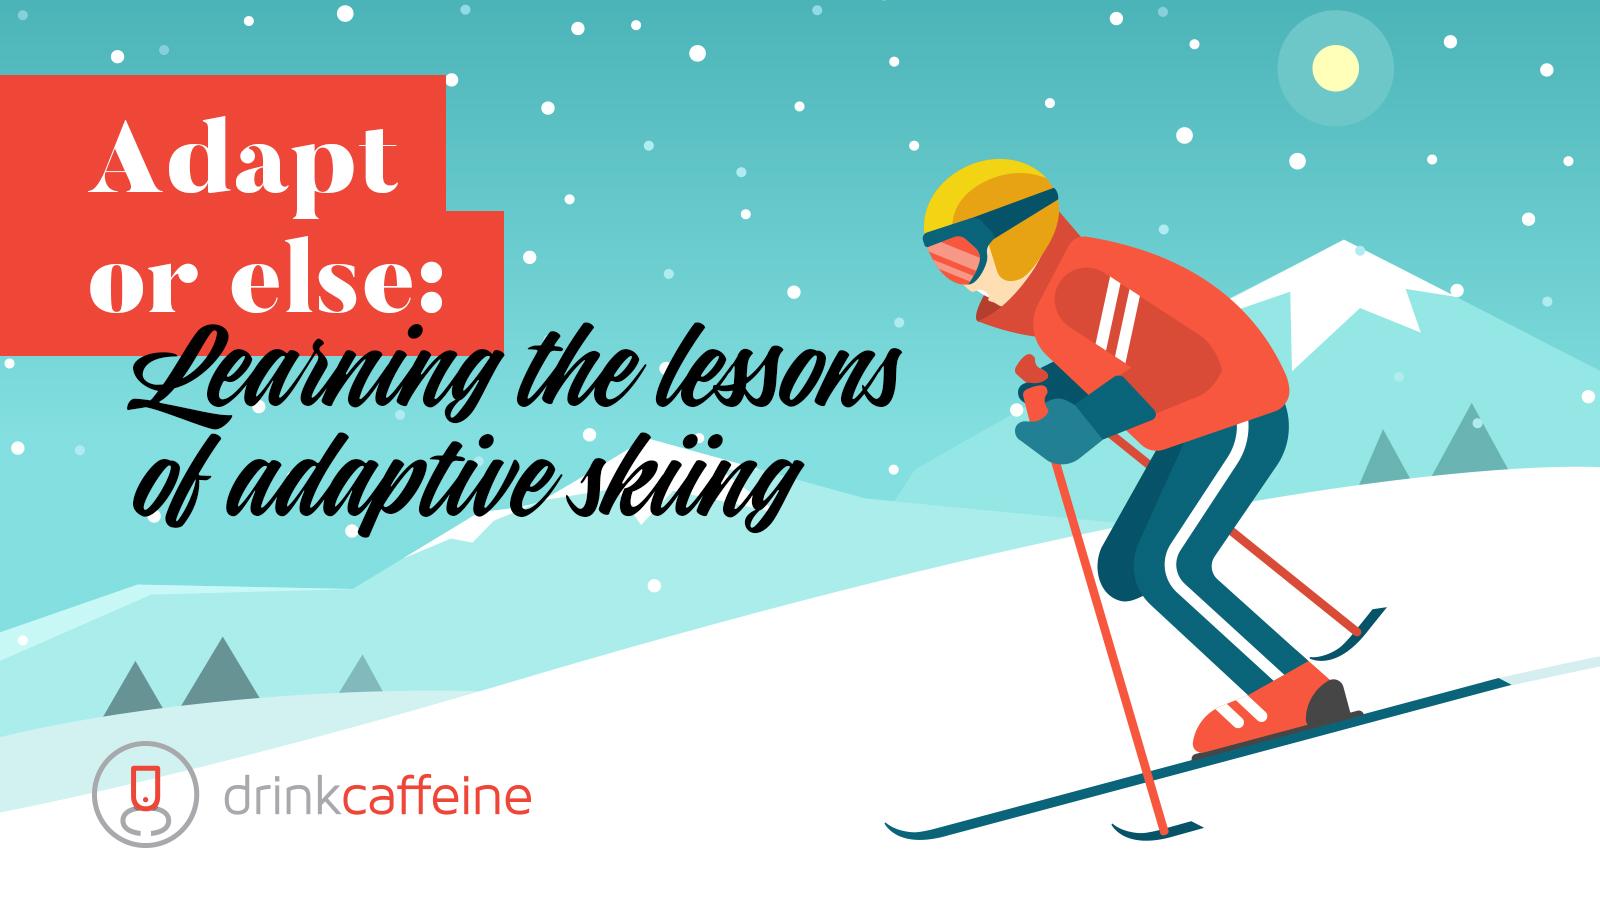 What adaptive skiing teaches us blog image